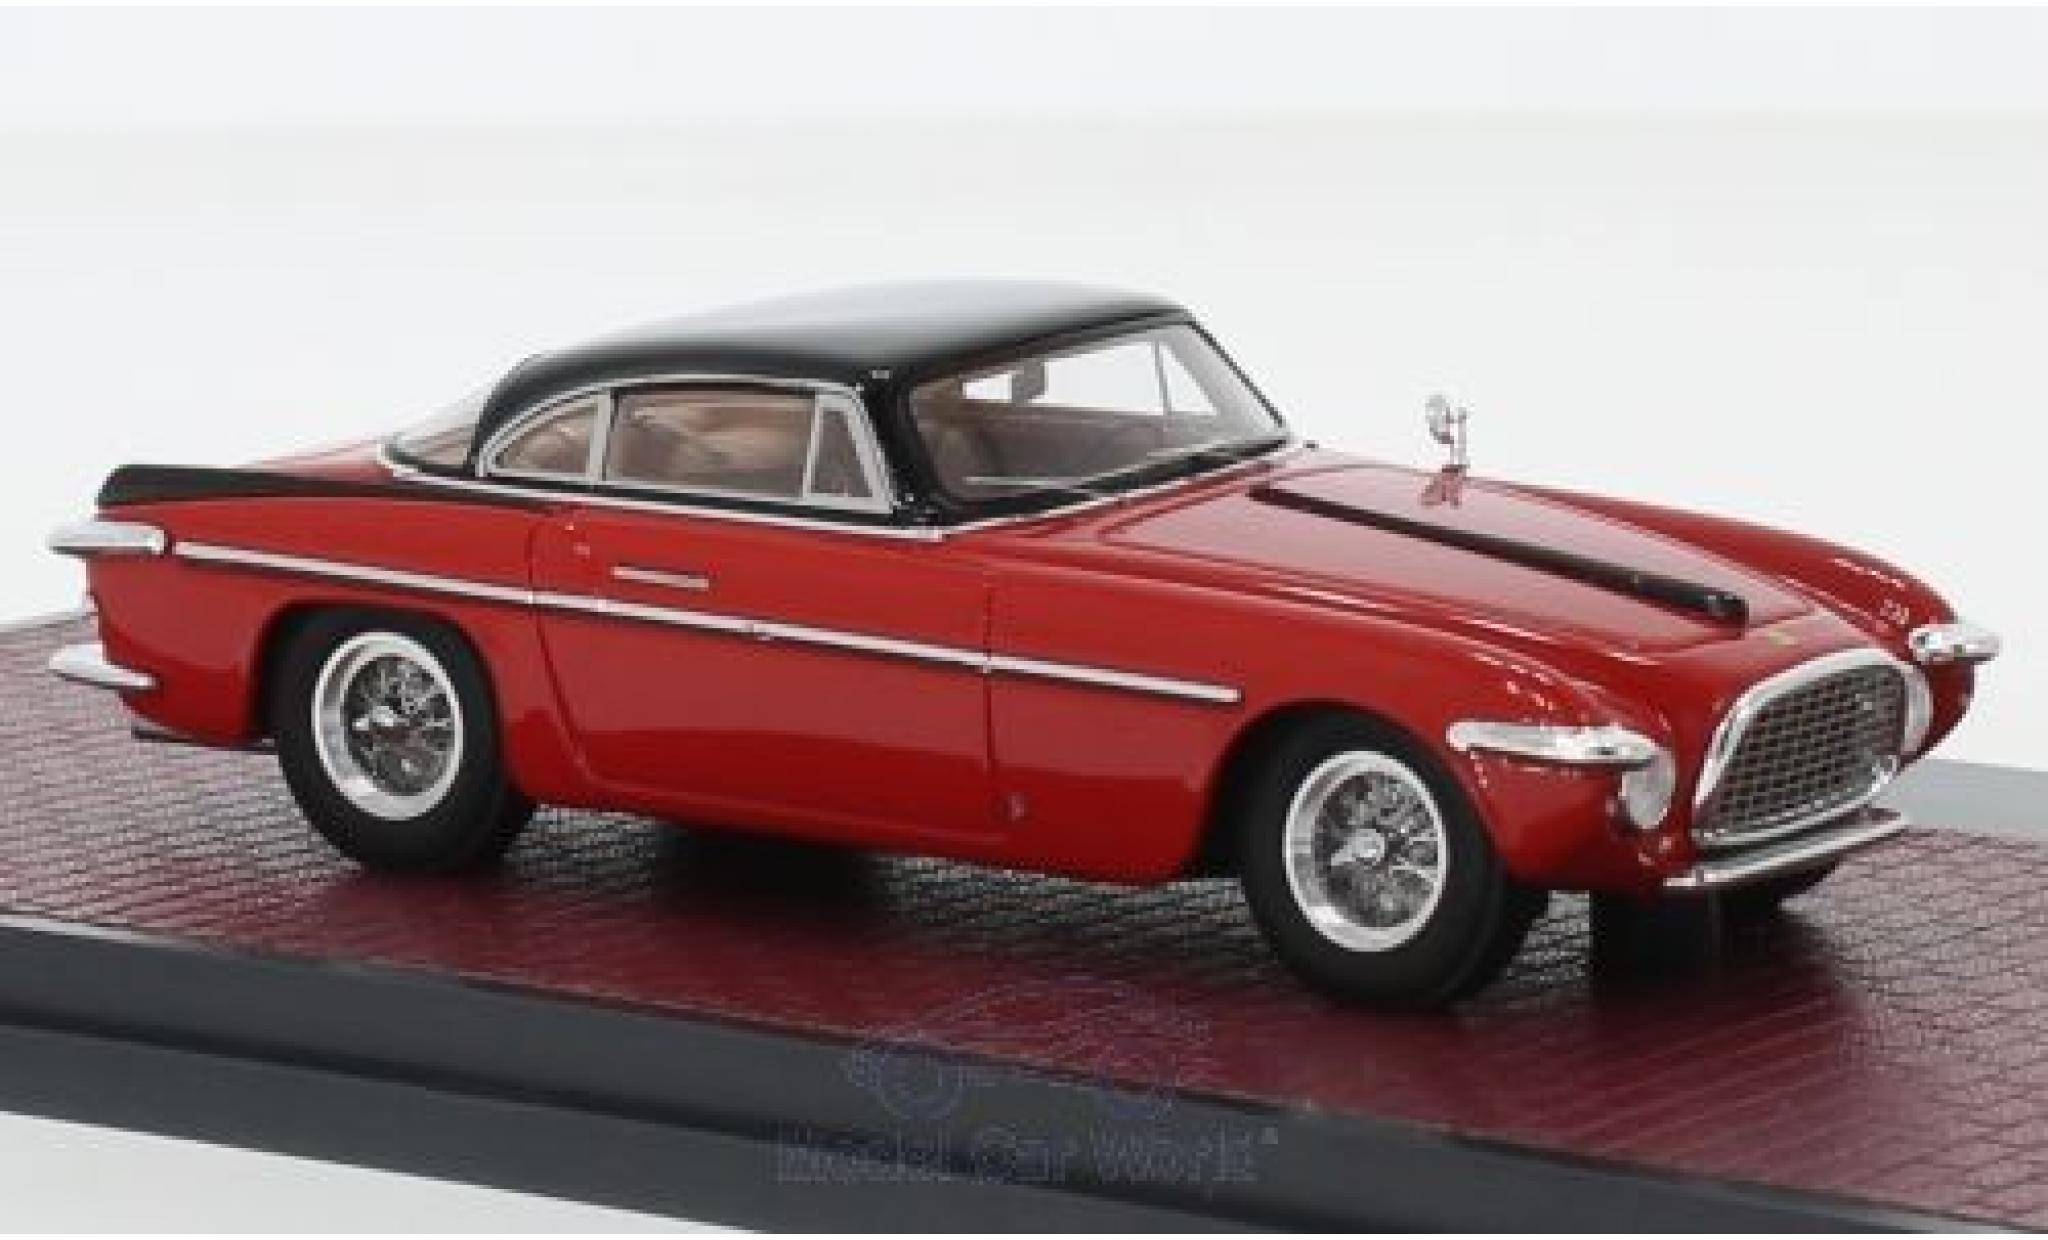 Ferrari 212 1/43 Matrix Inter Coupe Vignale red/black RHD 1953